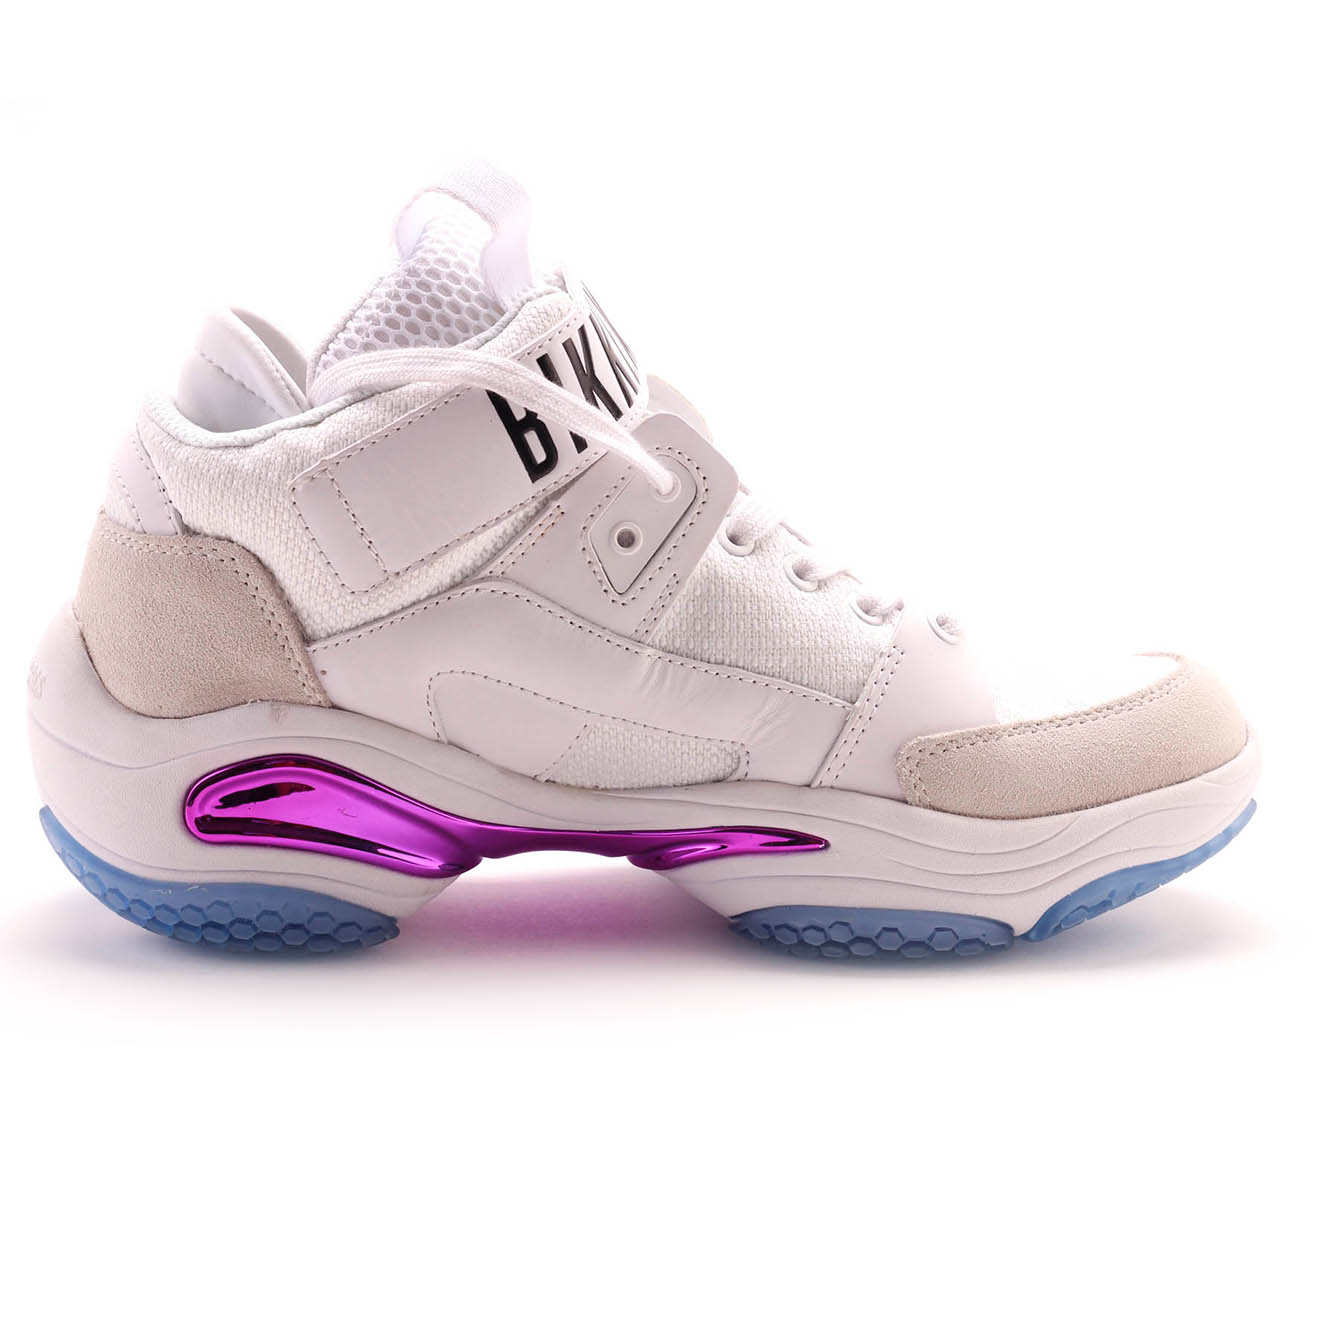 Sneakers montantes Platon en Cuir bleu/blanc/violet - Bikkembergs - Modalova